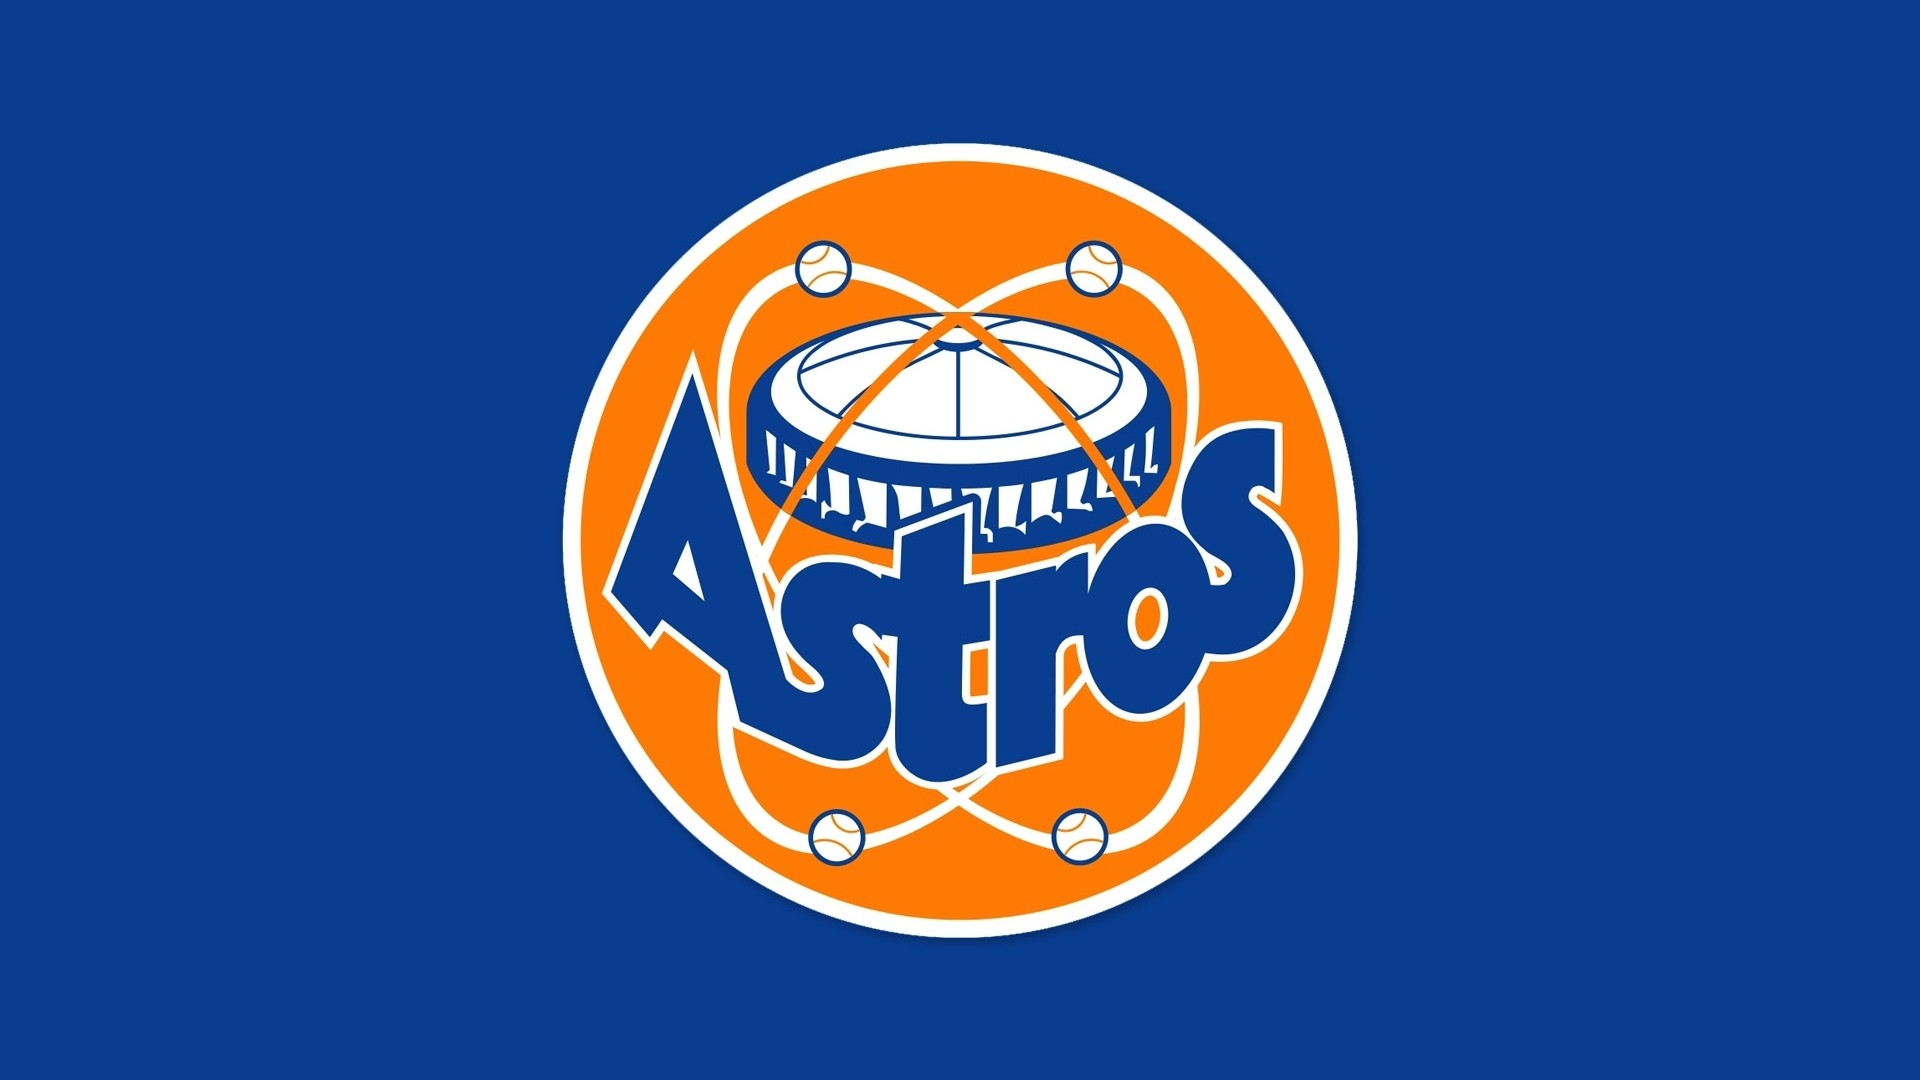 Houston Astros hd wallpaper download